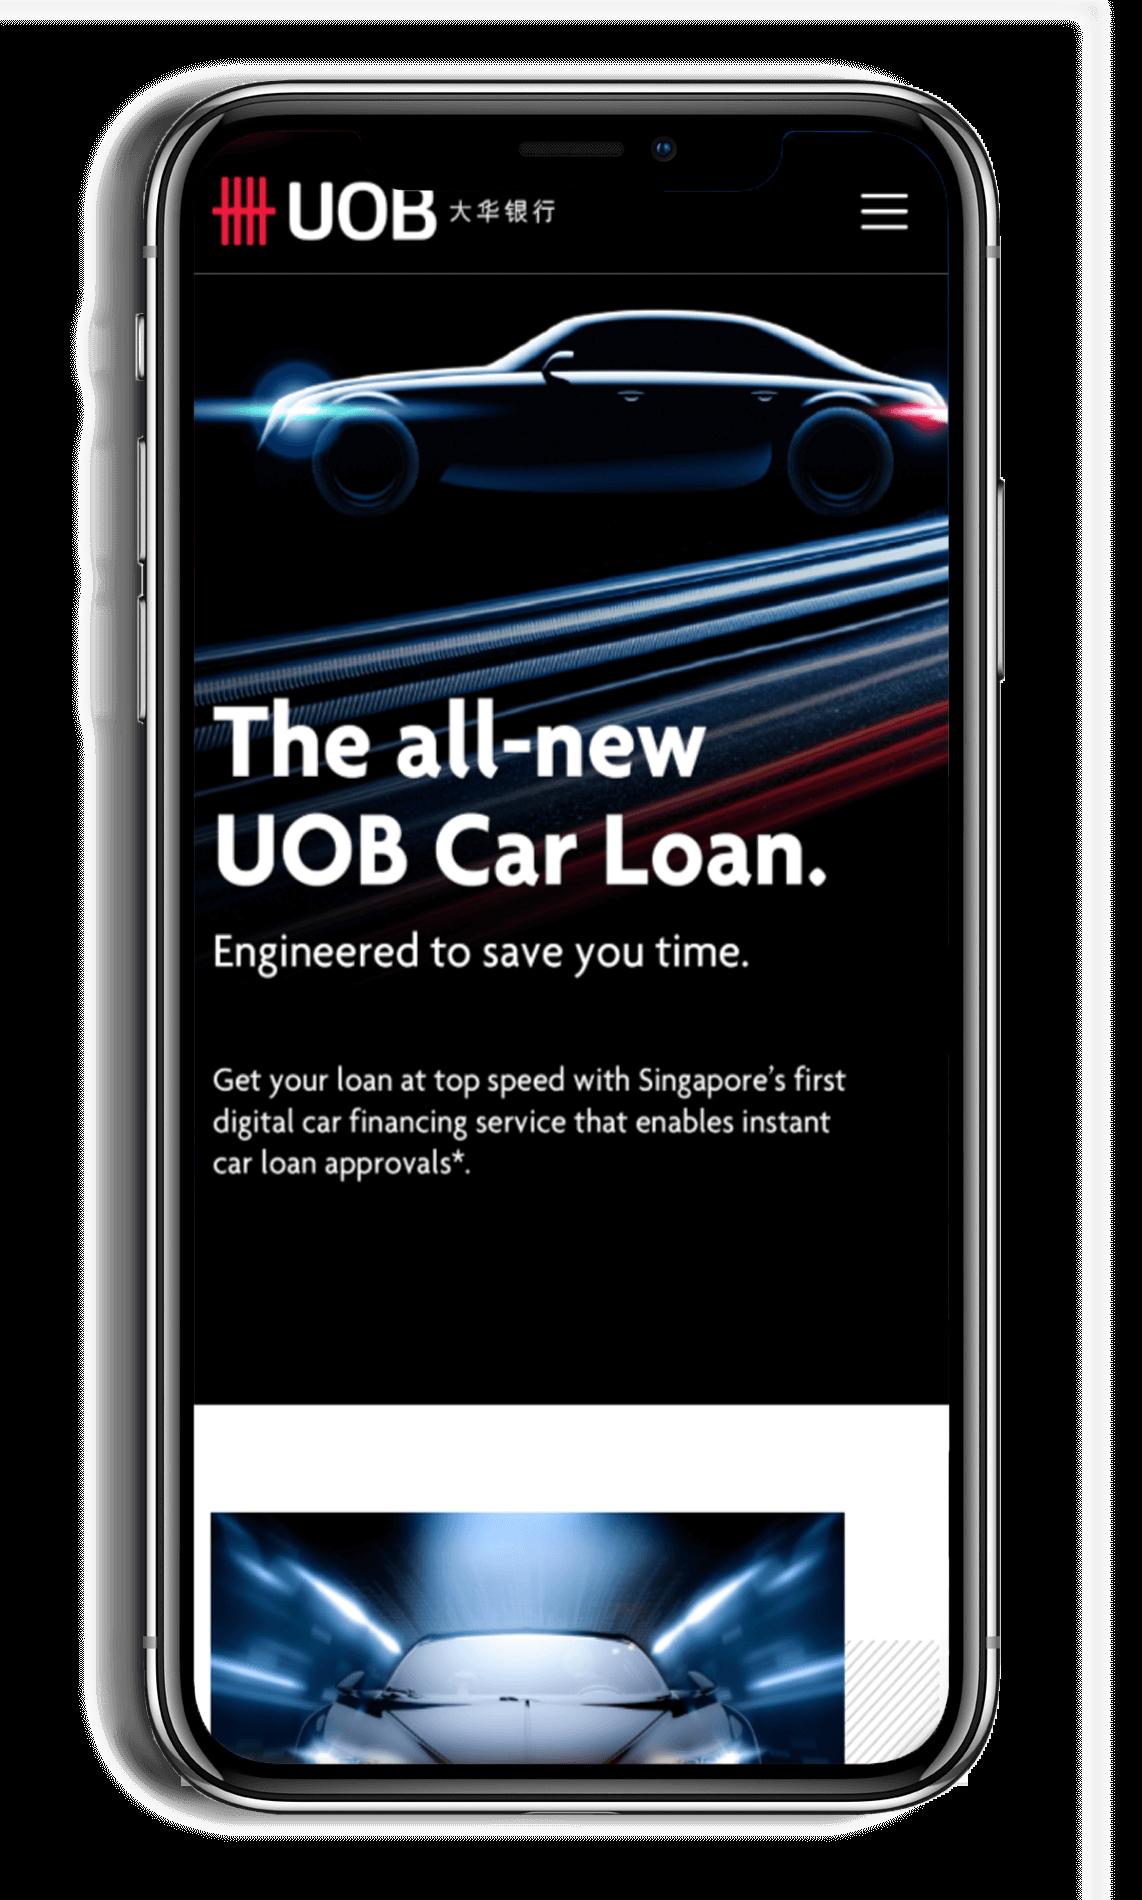 UOB Car Loan Microsite On Smartphone showing the all-new UOB car loan